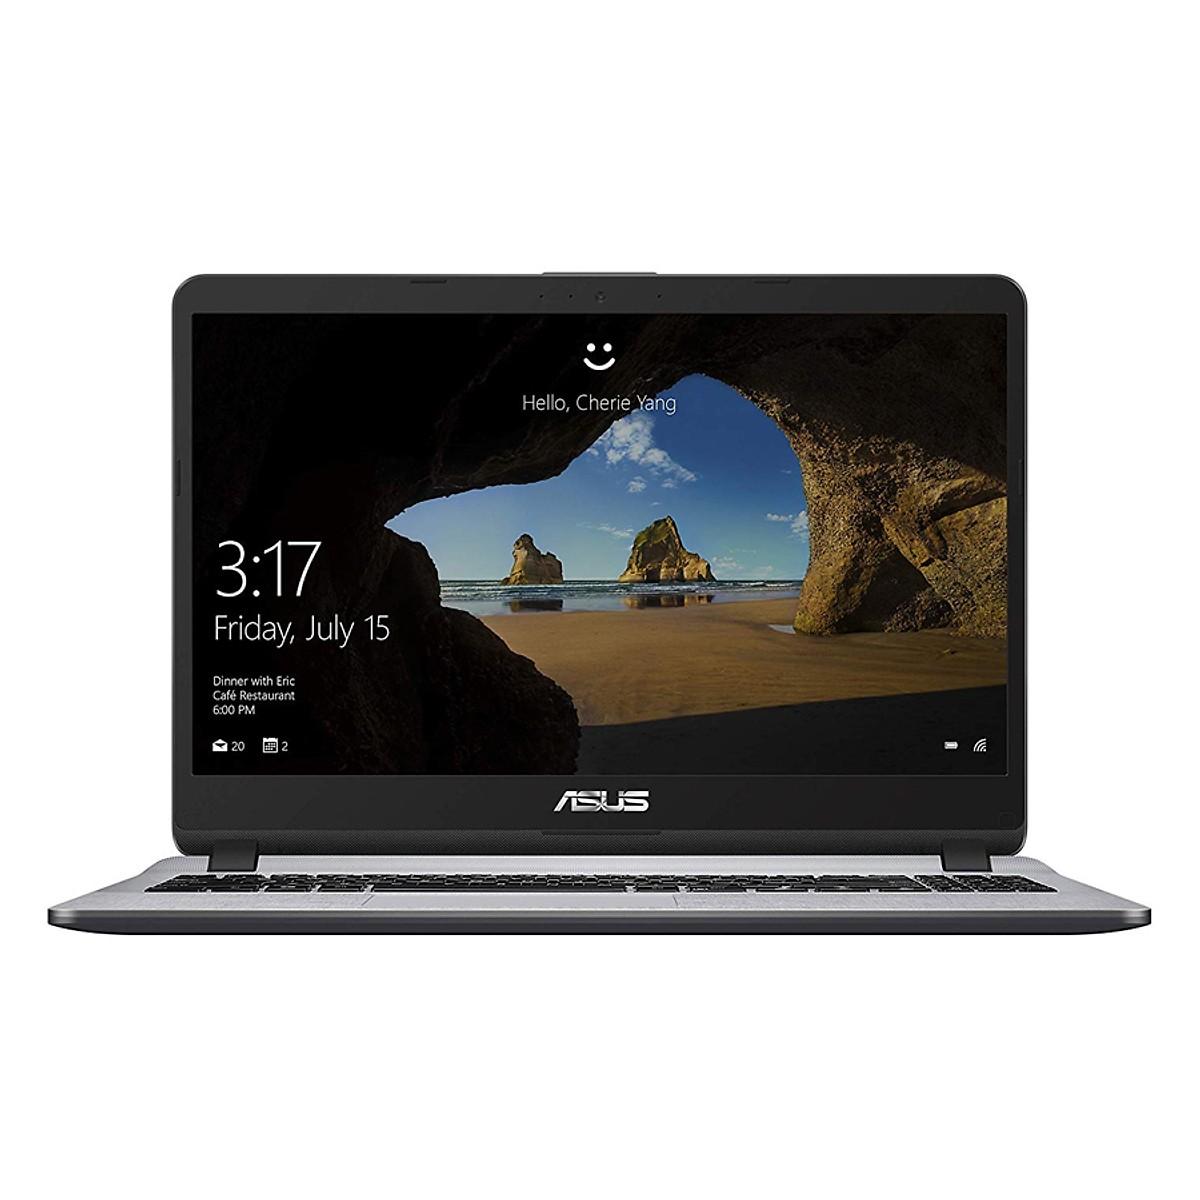 Asus   Máy tính xách tay - Laptop  Laptop Asus Vivobook X507UA-EJ787T Core i3-7020U/ Win10 (15.6